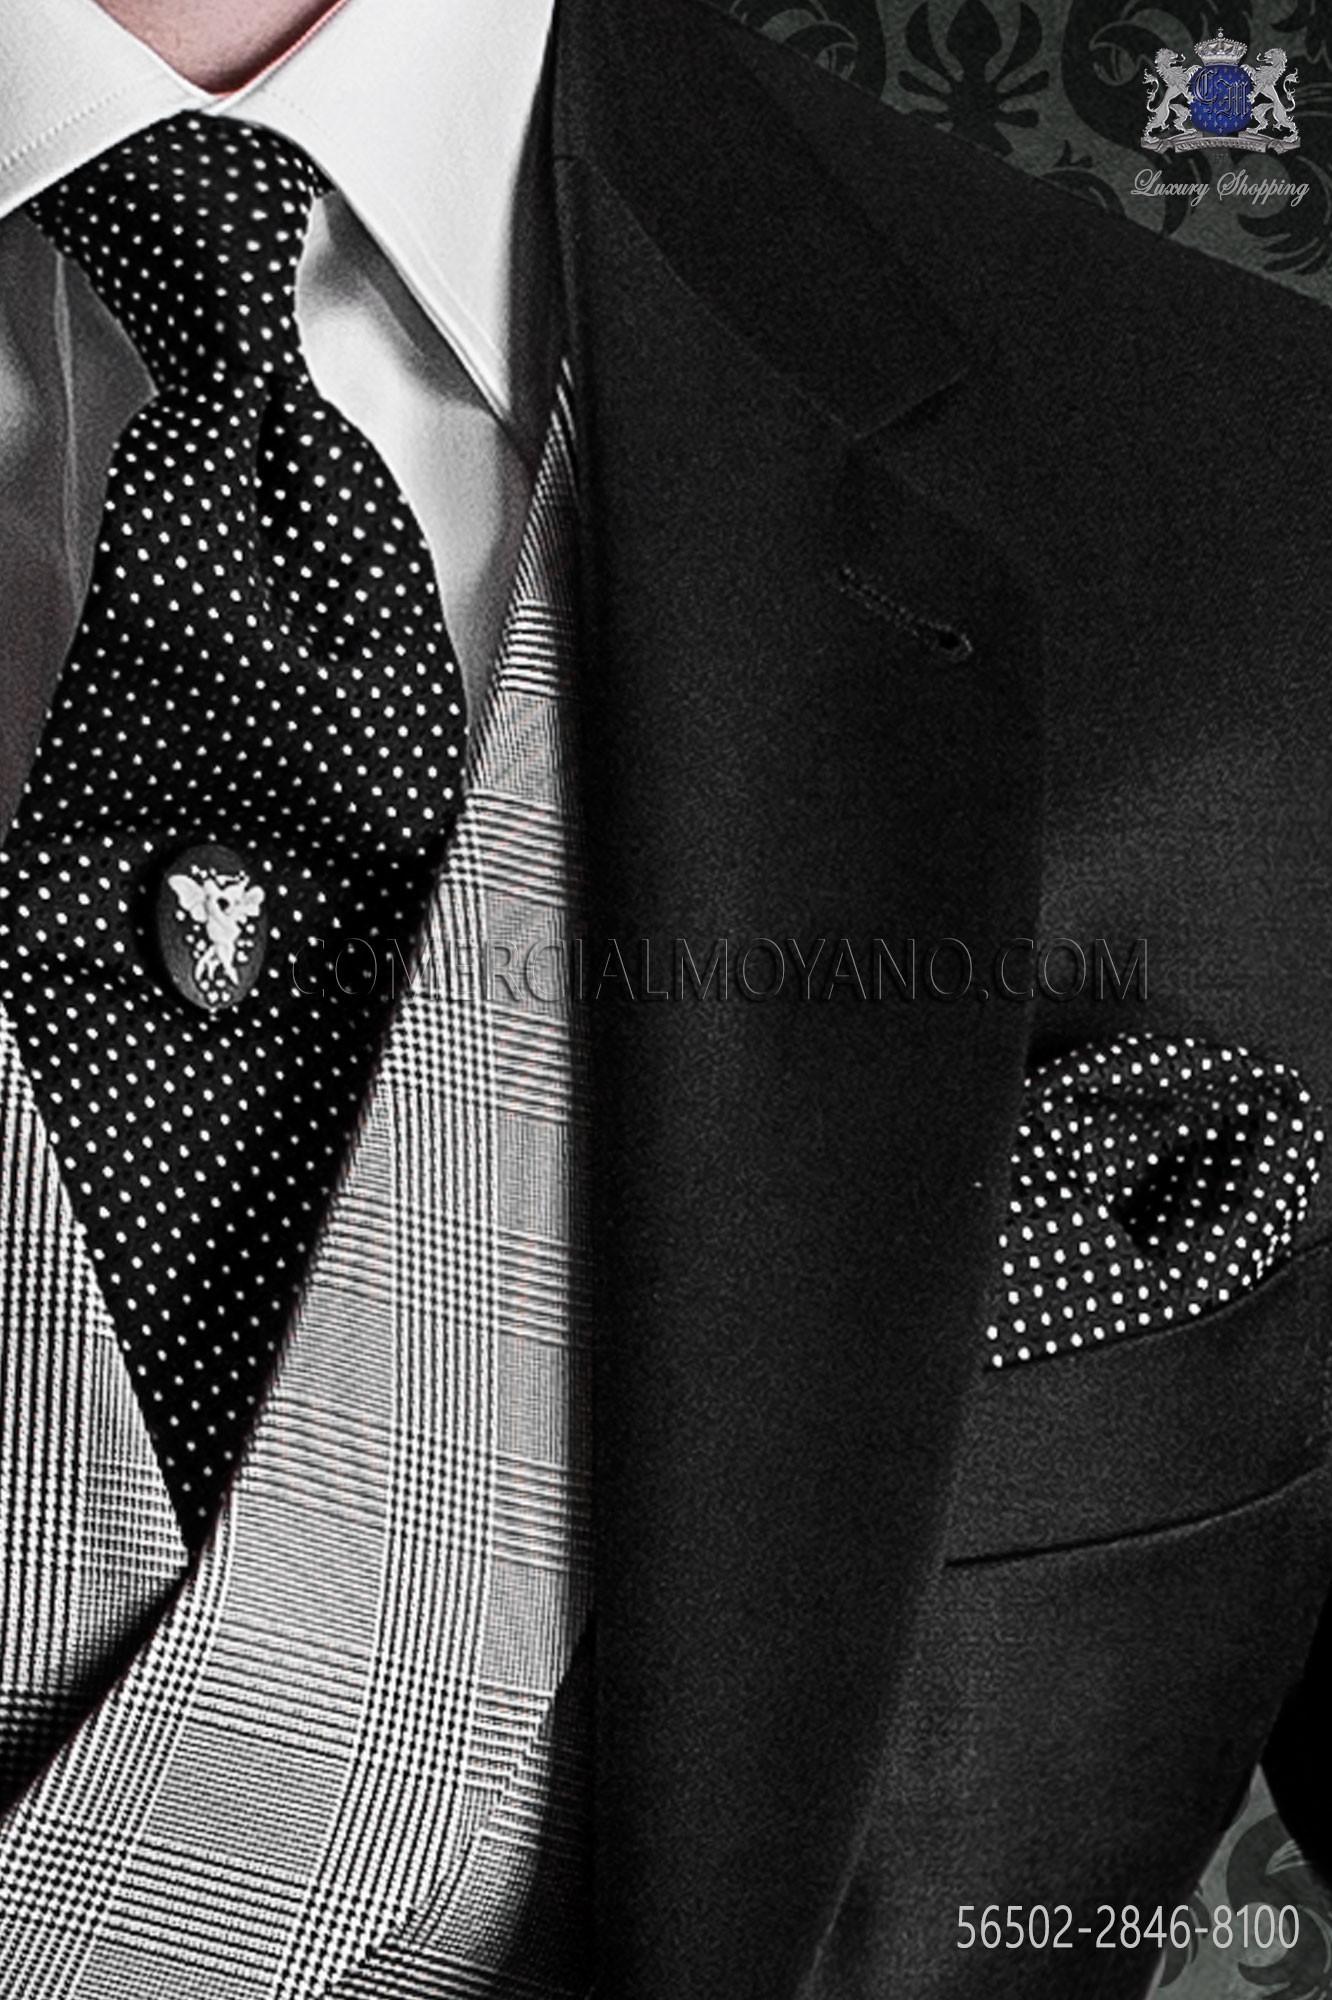 47ad12cd55f9 Black Polka Dots Tie And Handkerchief Pure Jacquard Silk Ongala. Mens Black And  White ...